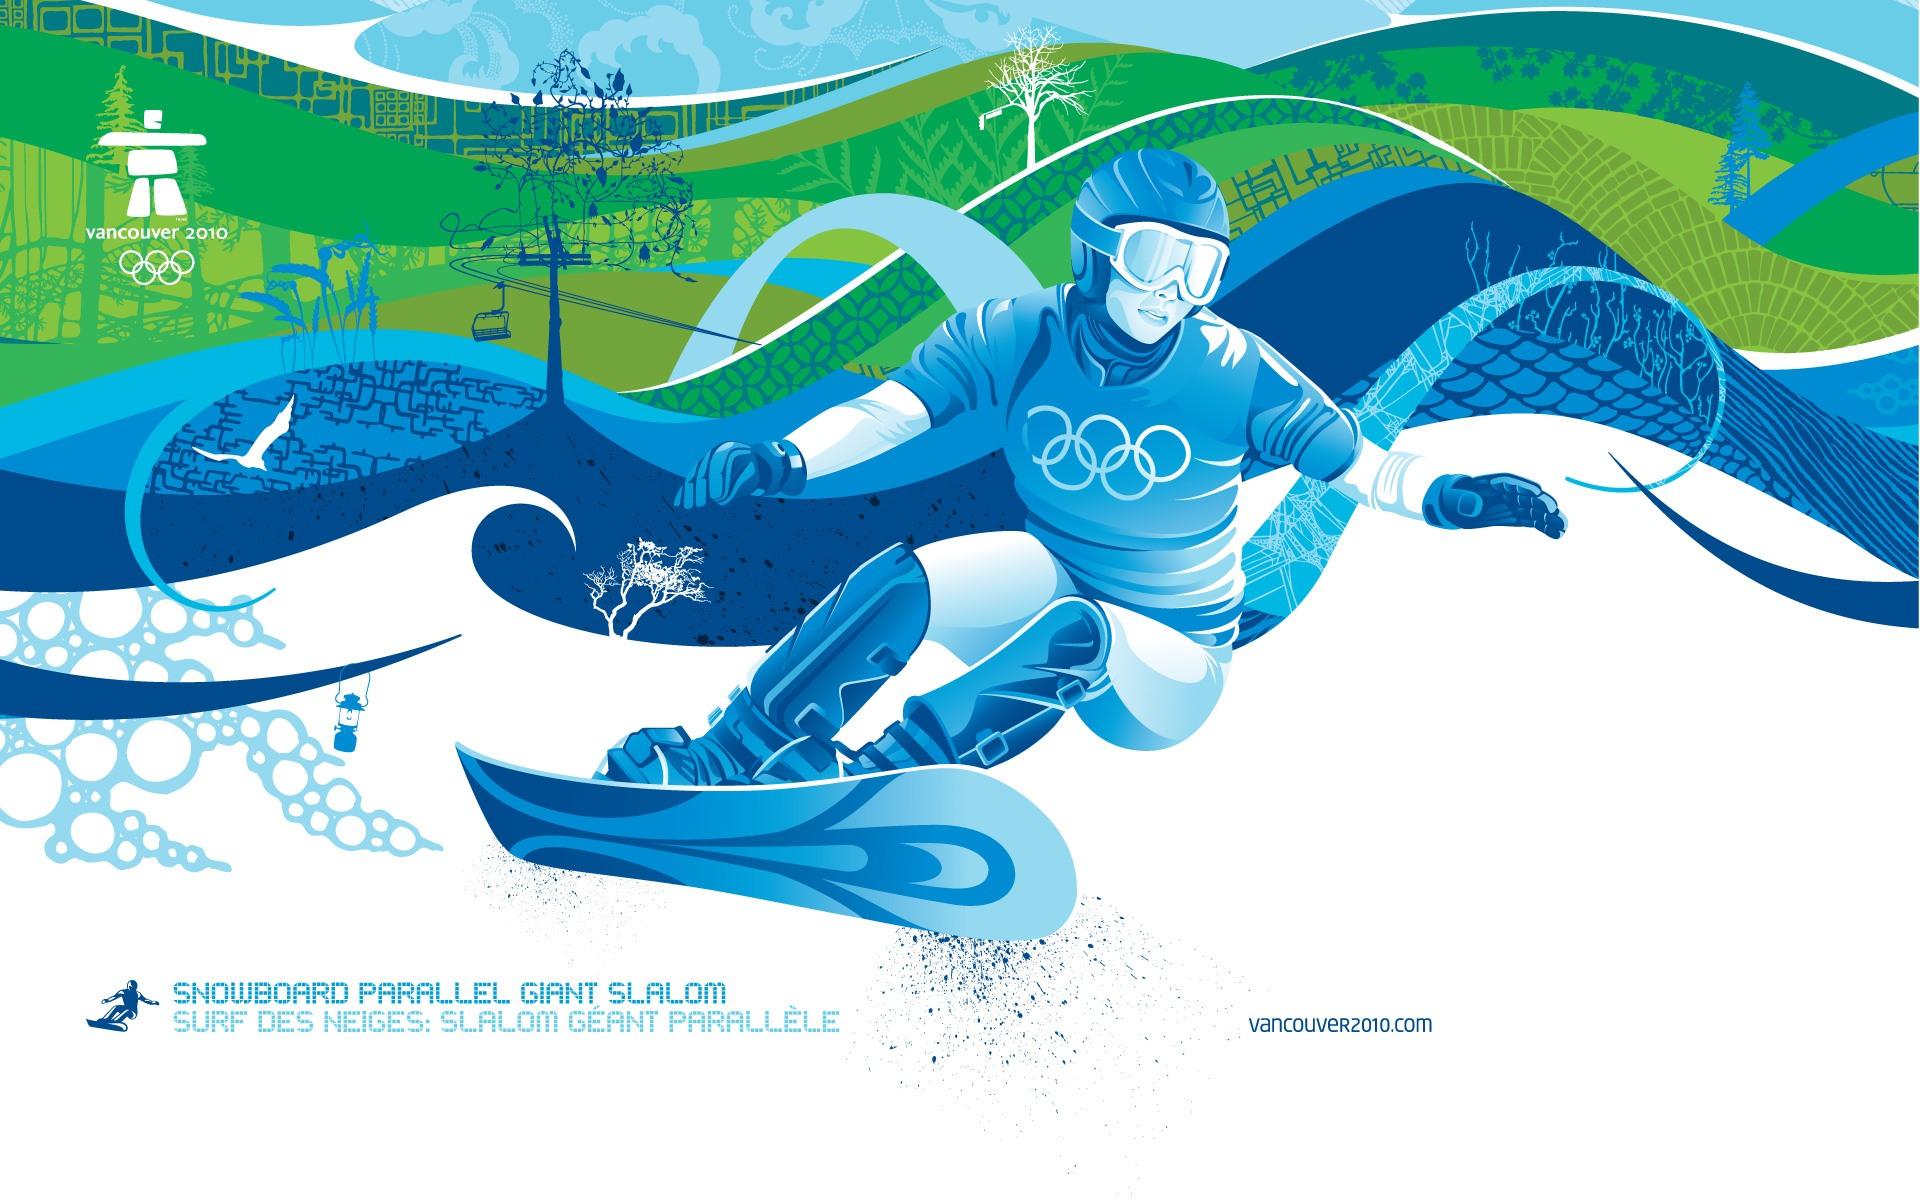 free sport wallpaper olympics - photo #29